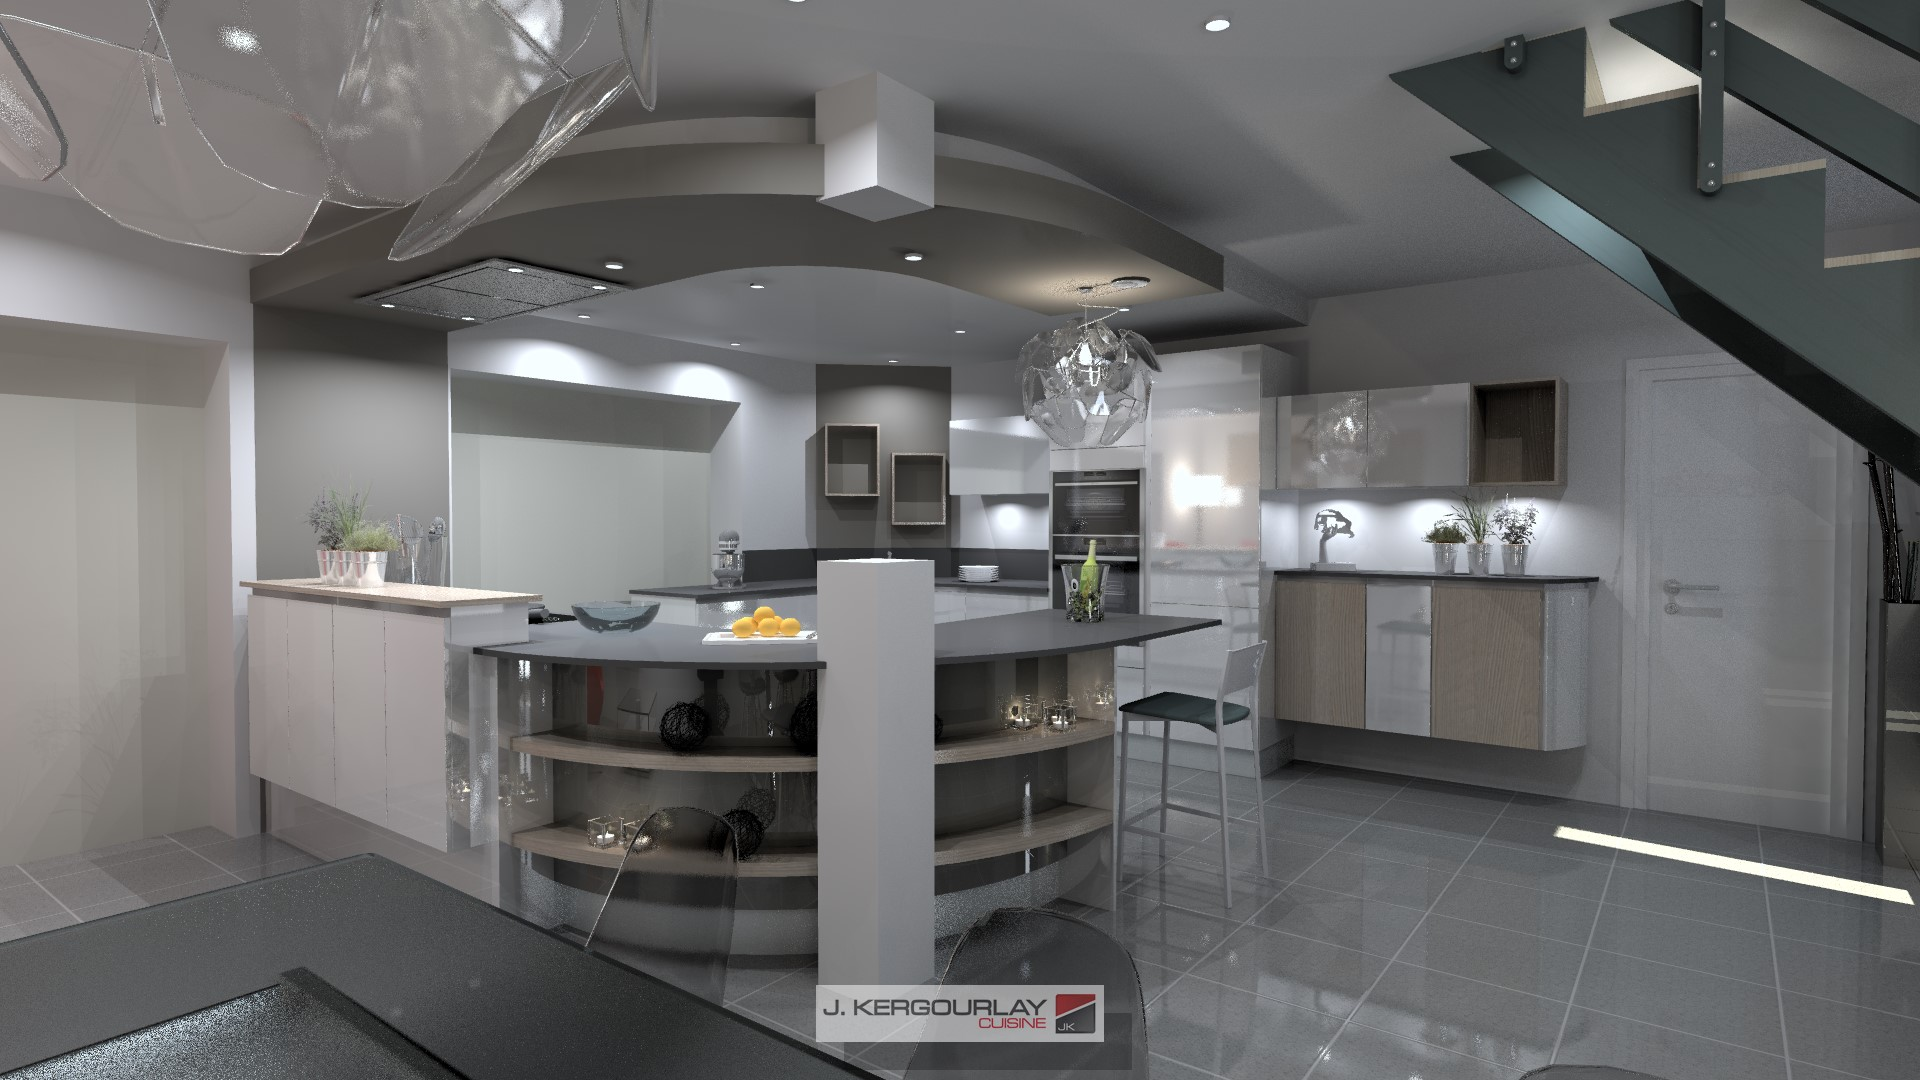 j kergourlay cuisines bains dressing fermetures rosporden. Black Bedroom Furniture Sets. Home Design Ideas